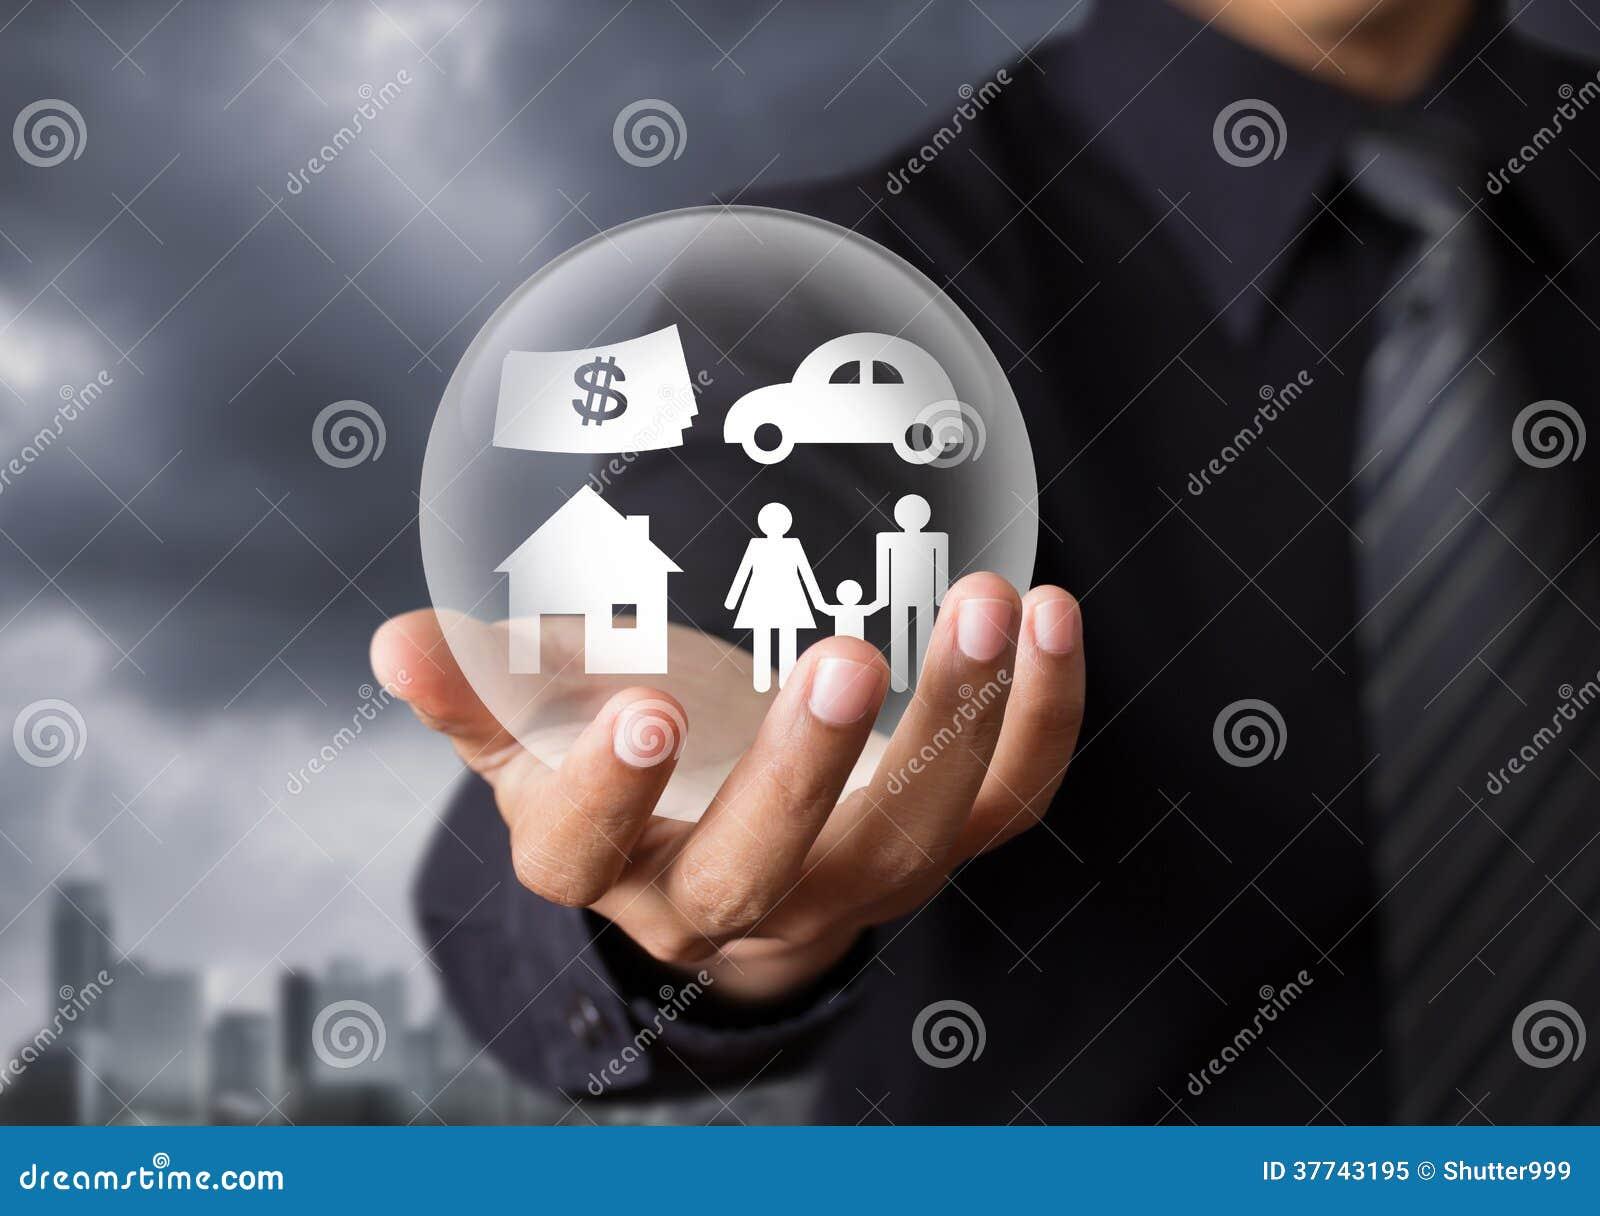 Life insurance concept